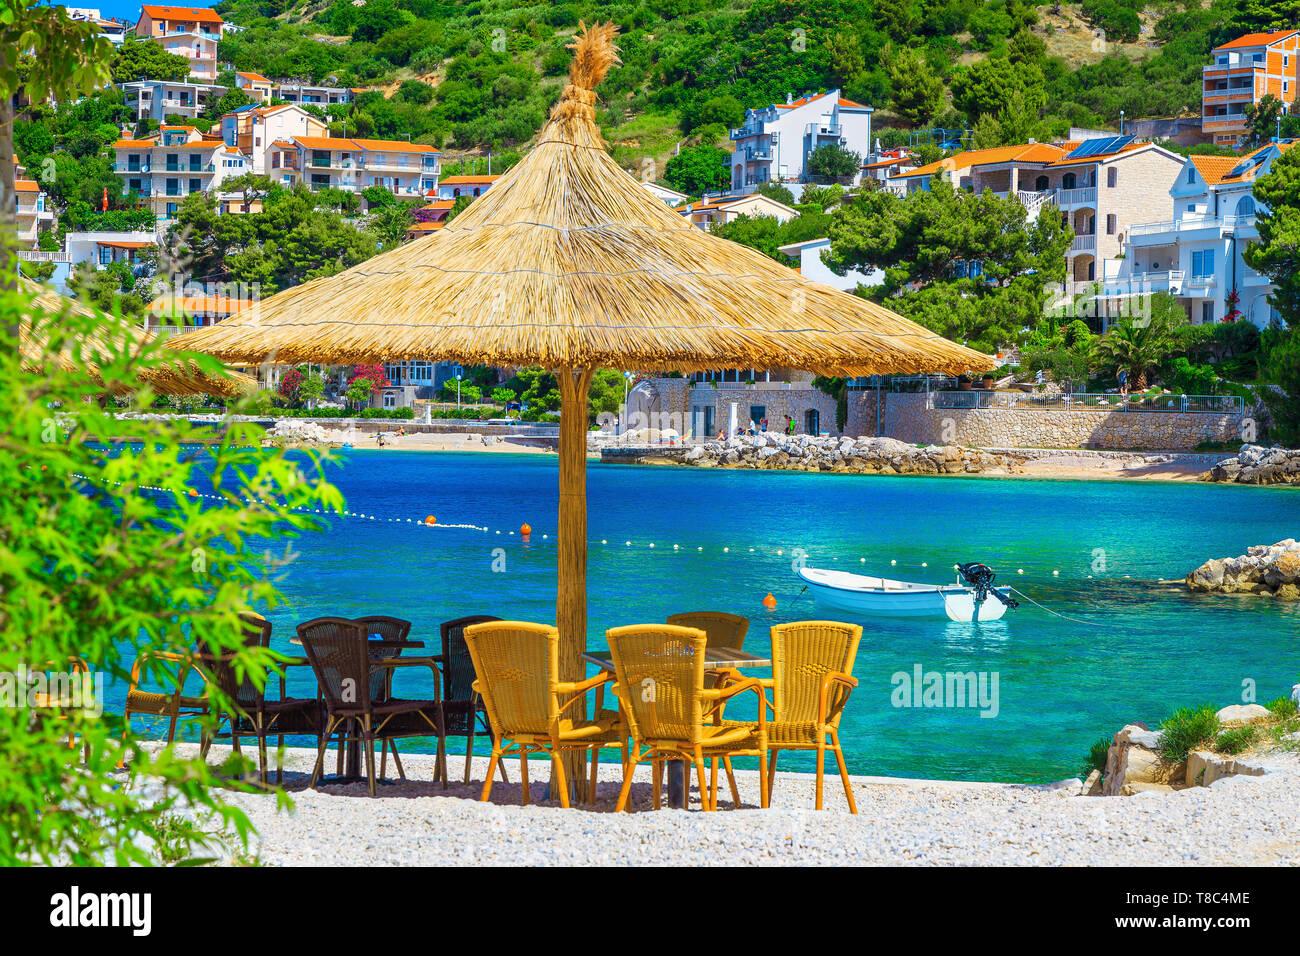 Fantastic summer holiday destination. Cozy outdoor tropical beach bar with straw parasols and beautiful view, Brela, Makarska riviera, Dalmatia, Croat - Stock Image